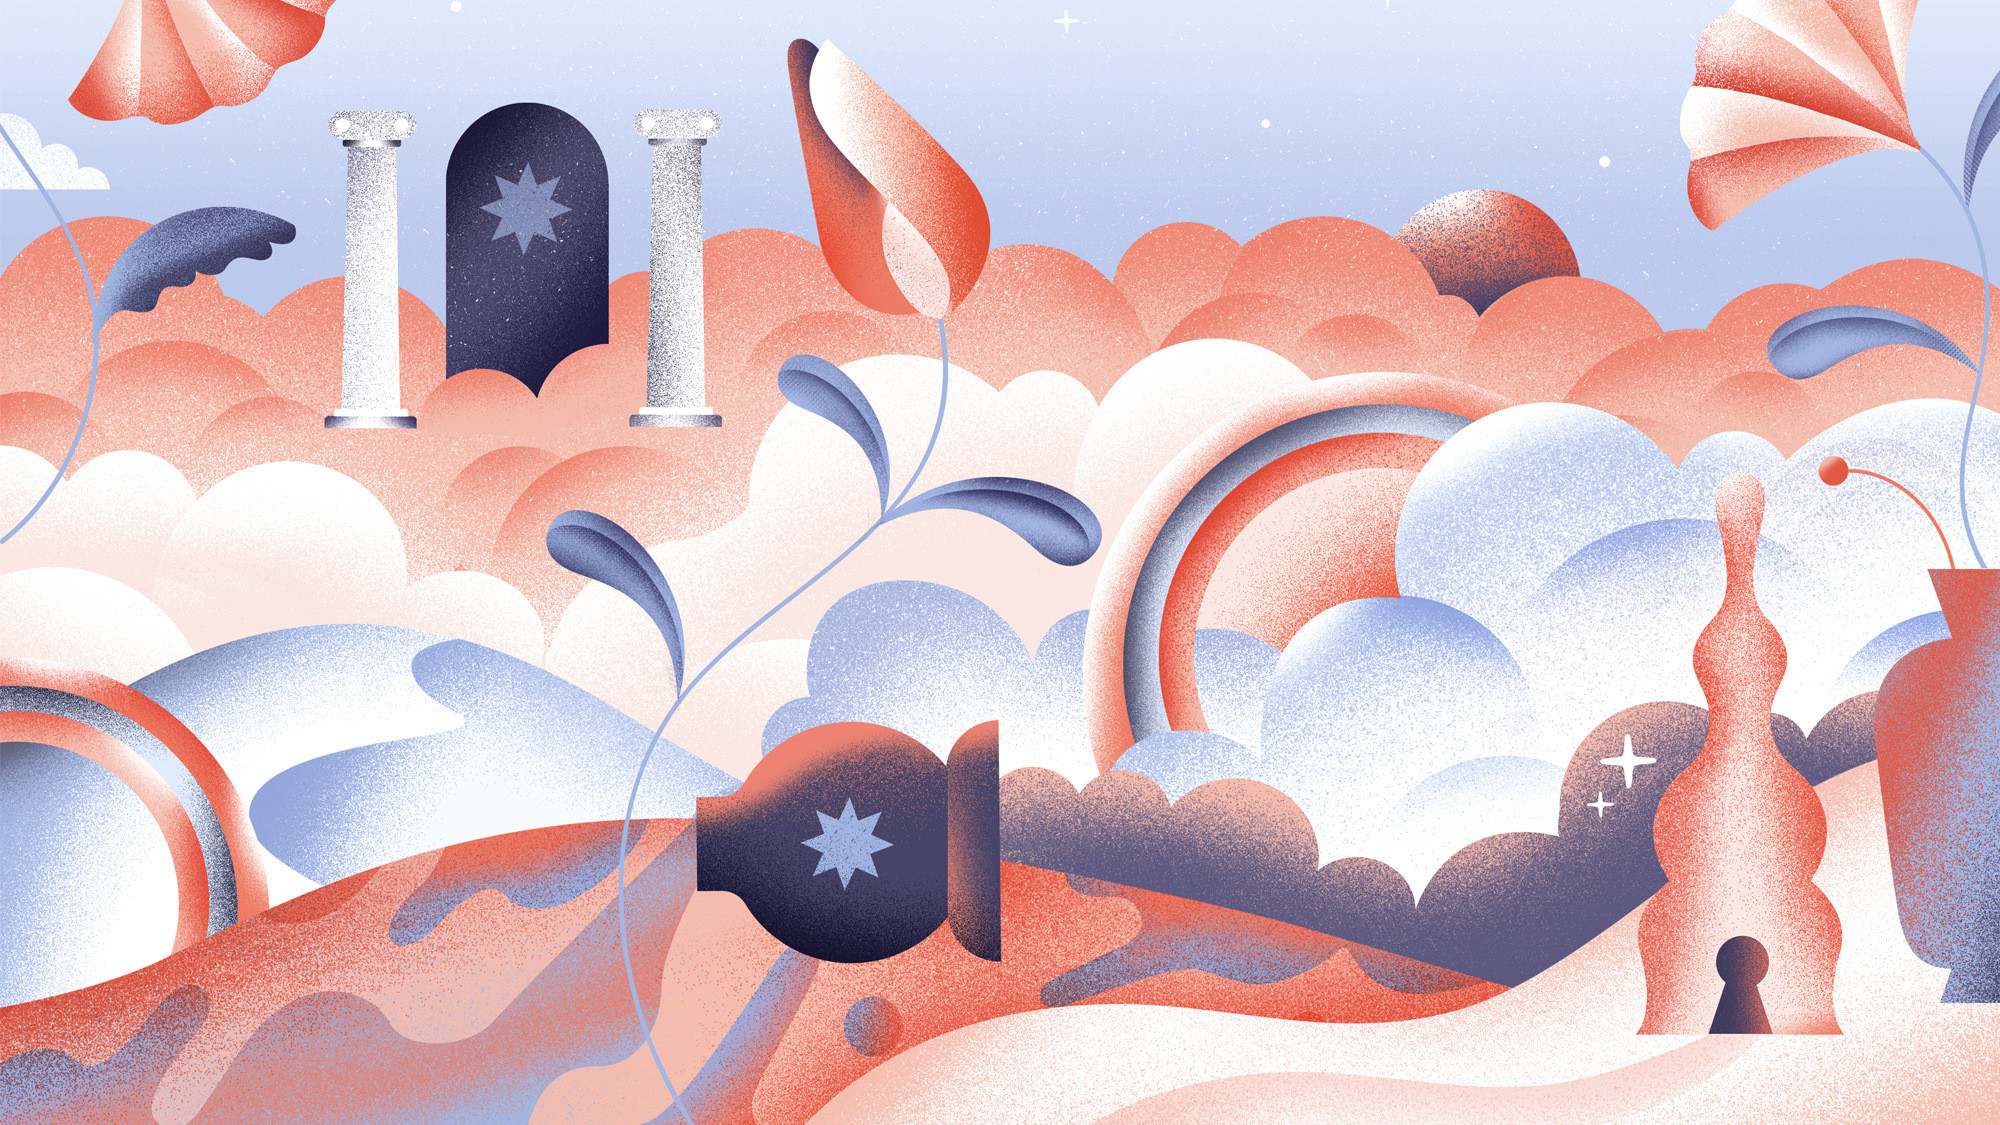 Illustration by Bárbara Malagoli